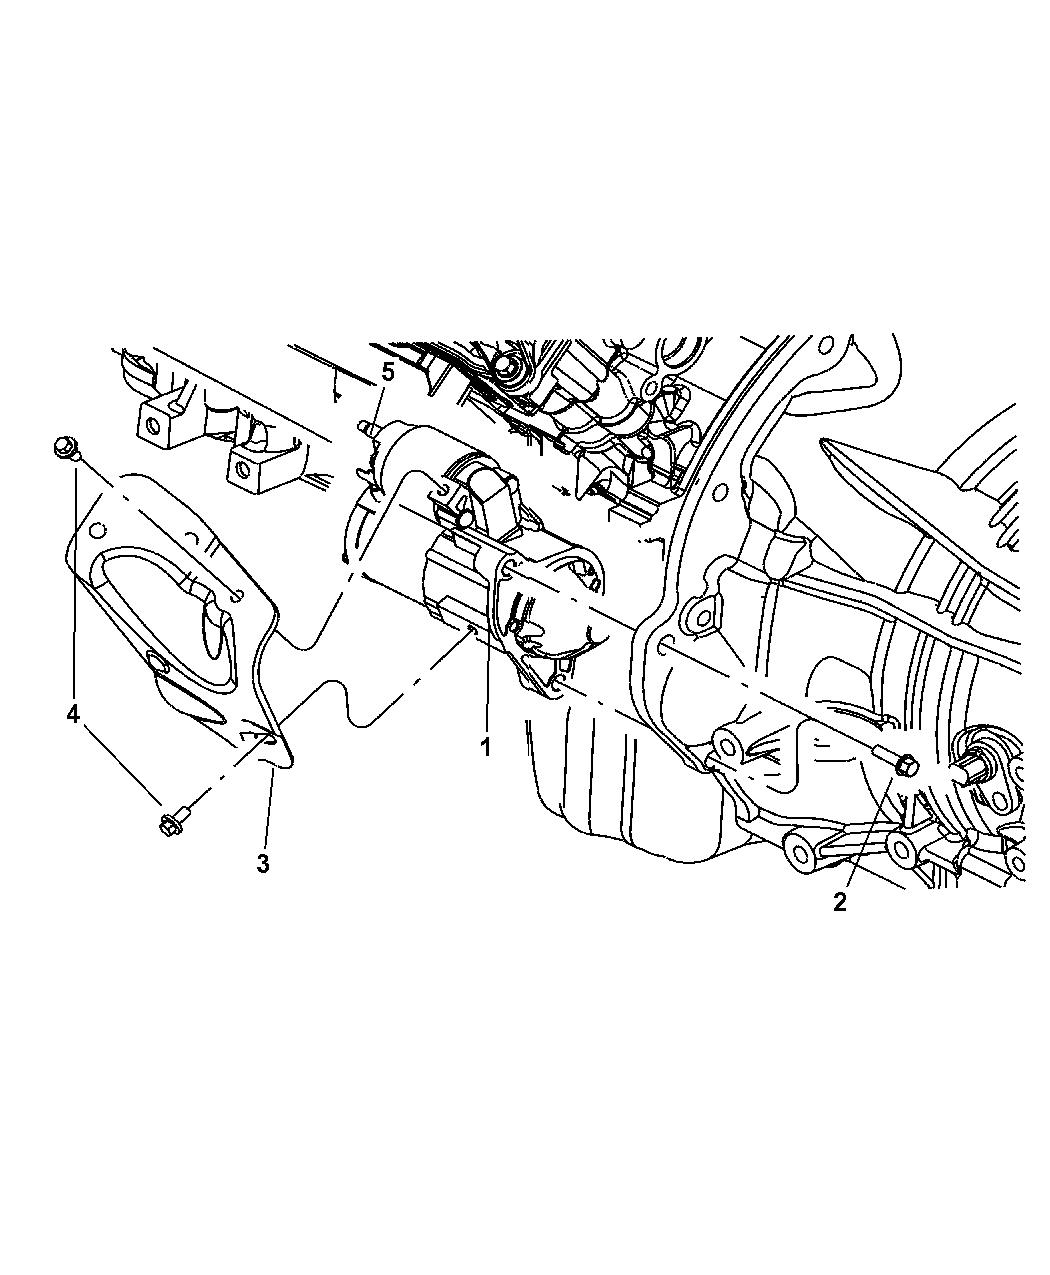 56044735ac